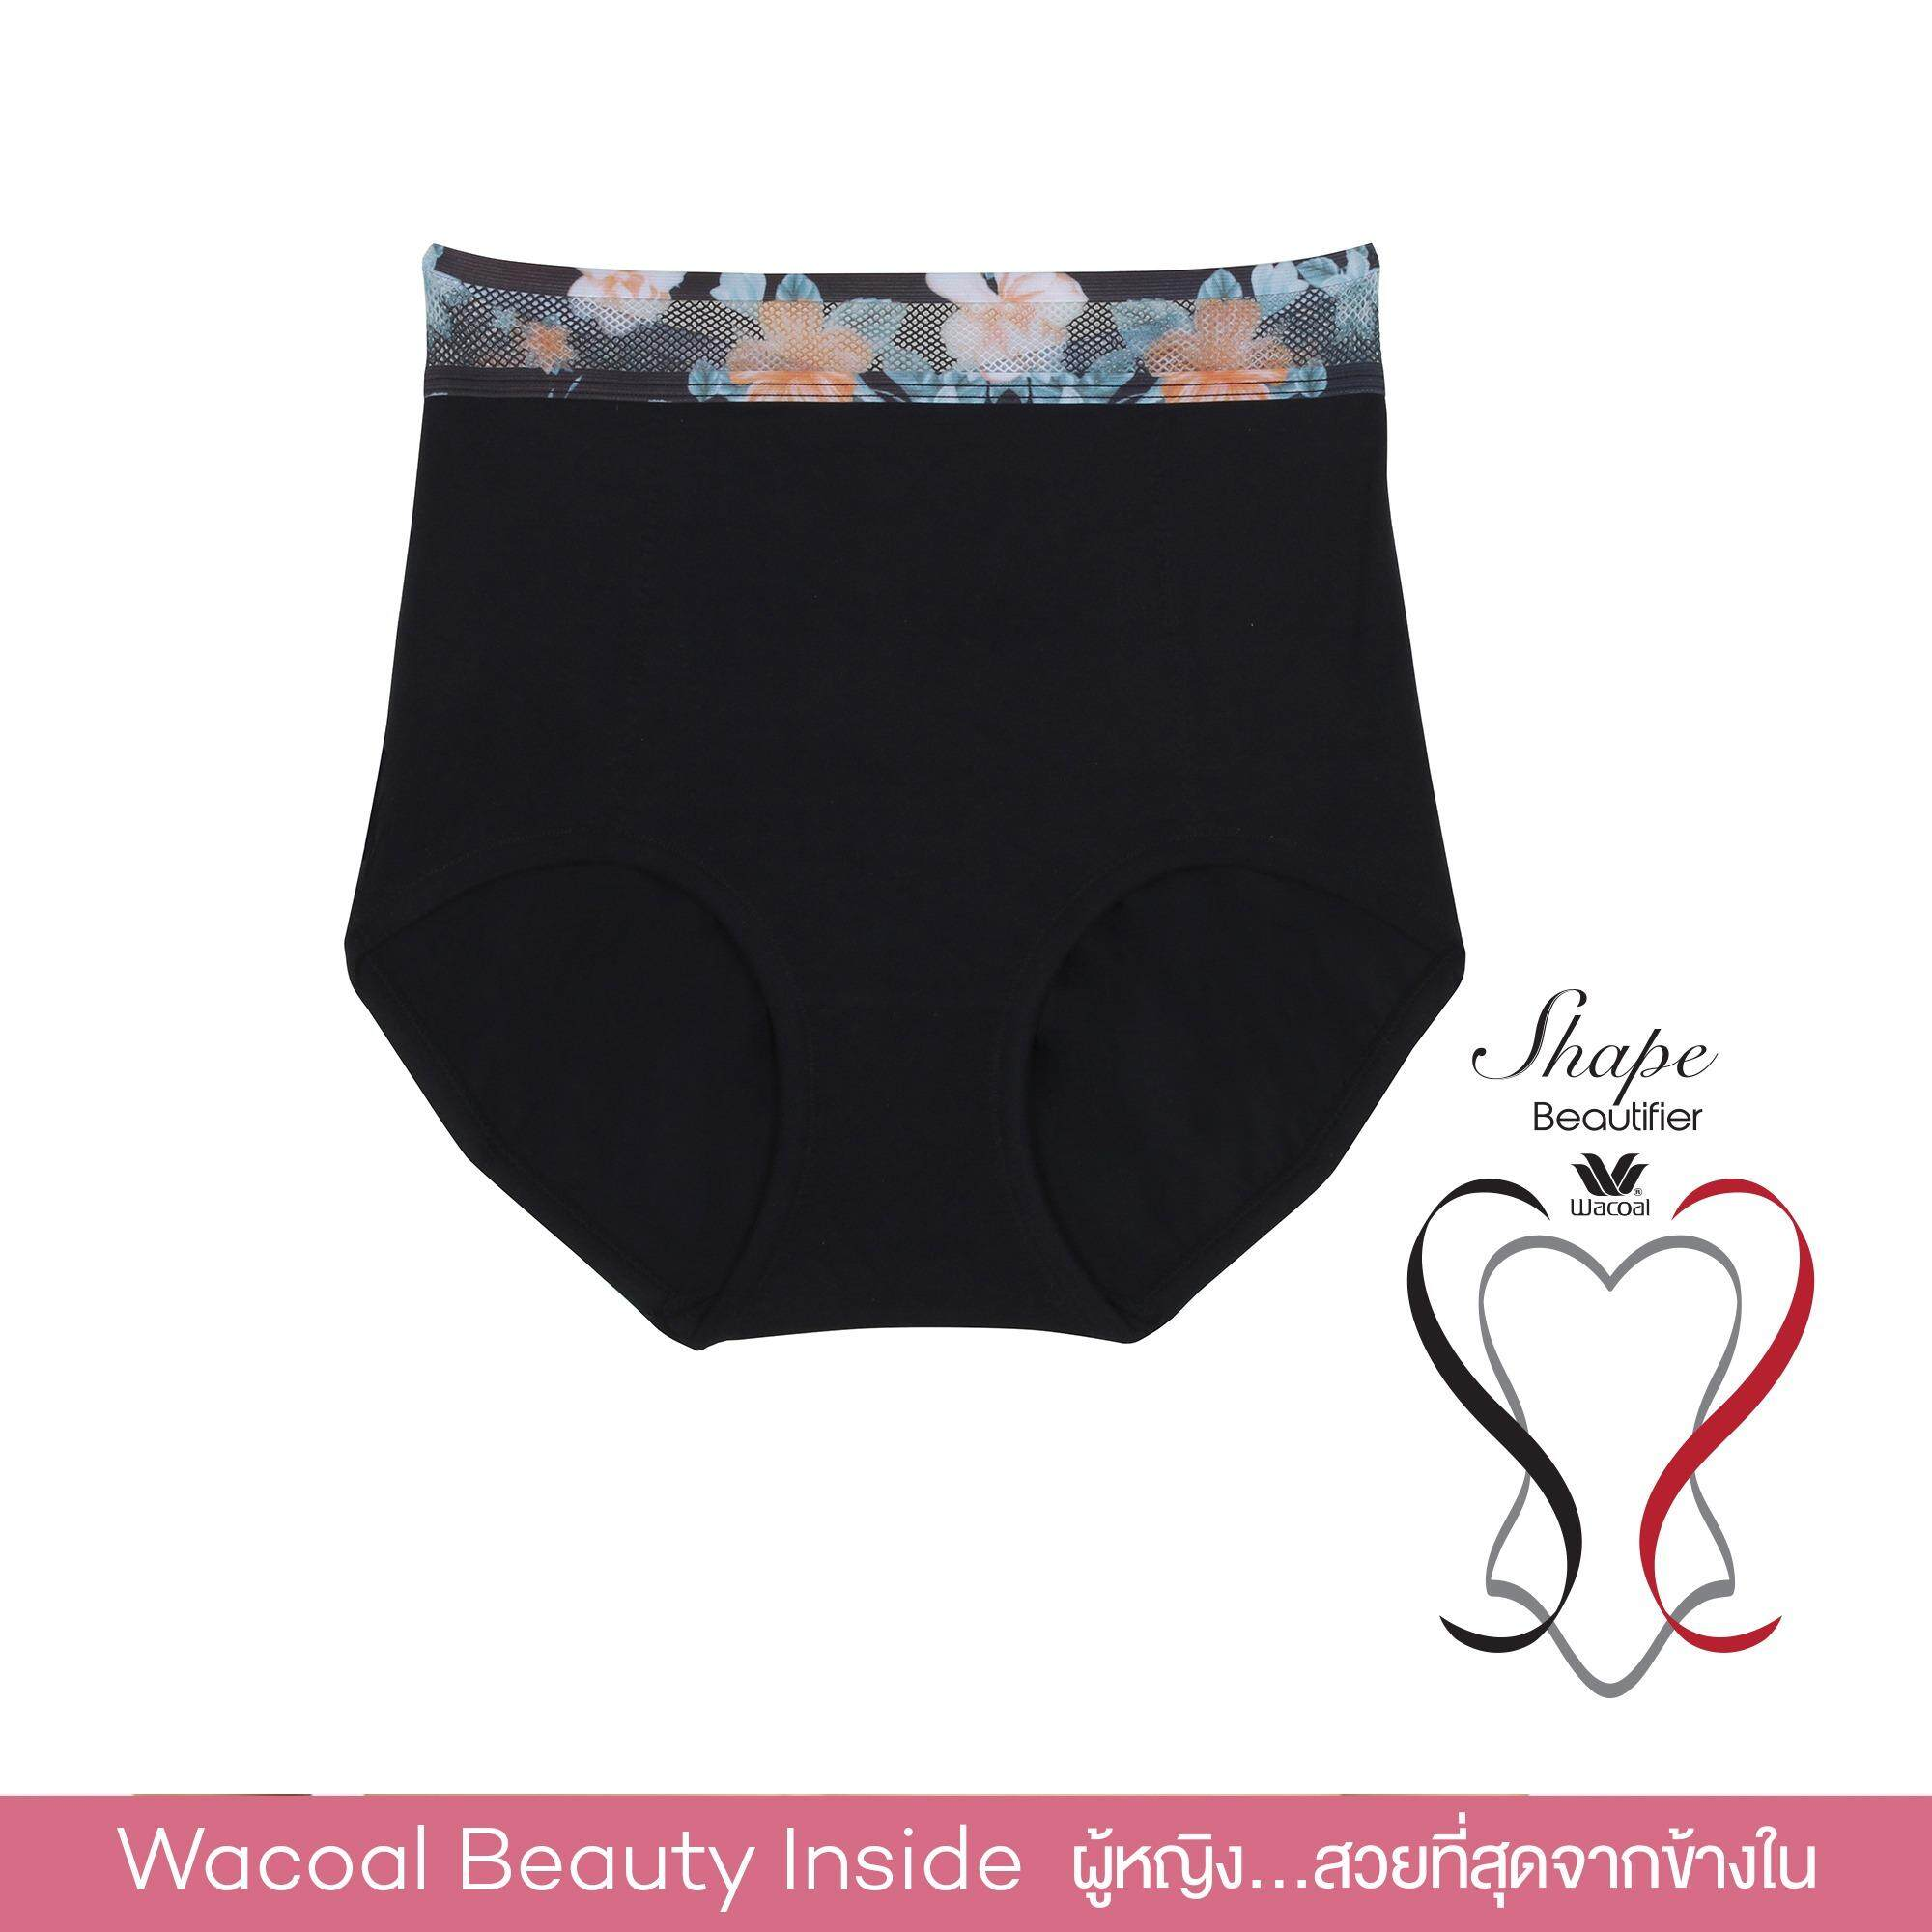 Wacoal Pants กางเกงเก็บกระชับ สีดำ Black Wy1298Bl ถูก